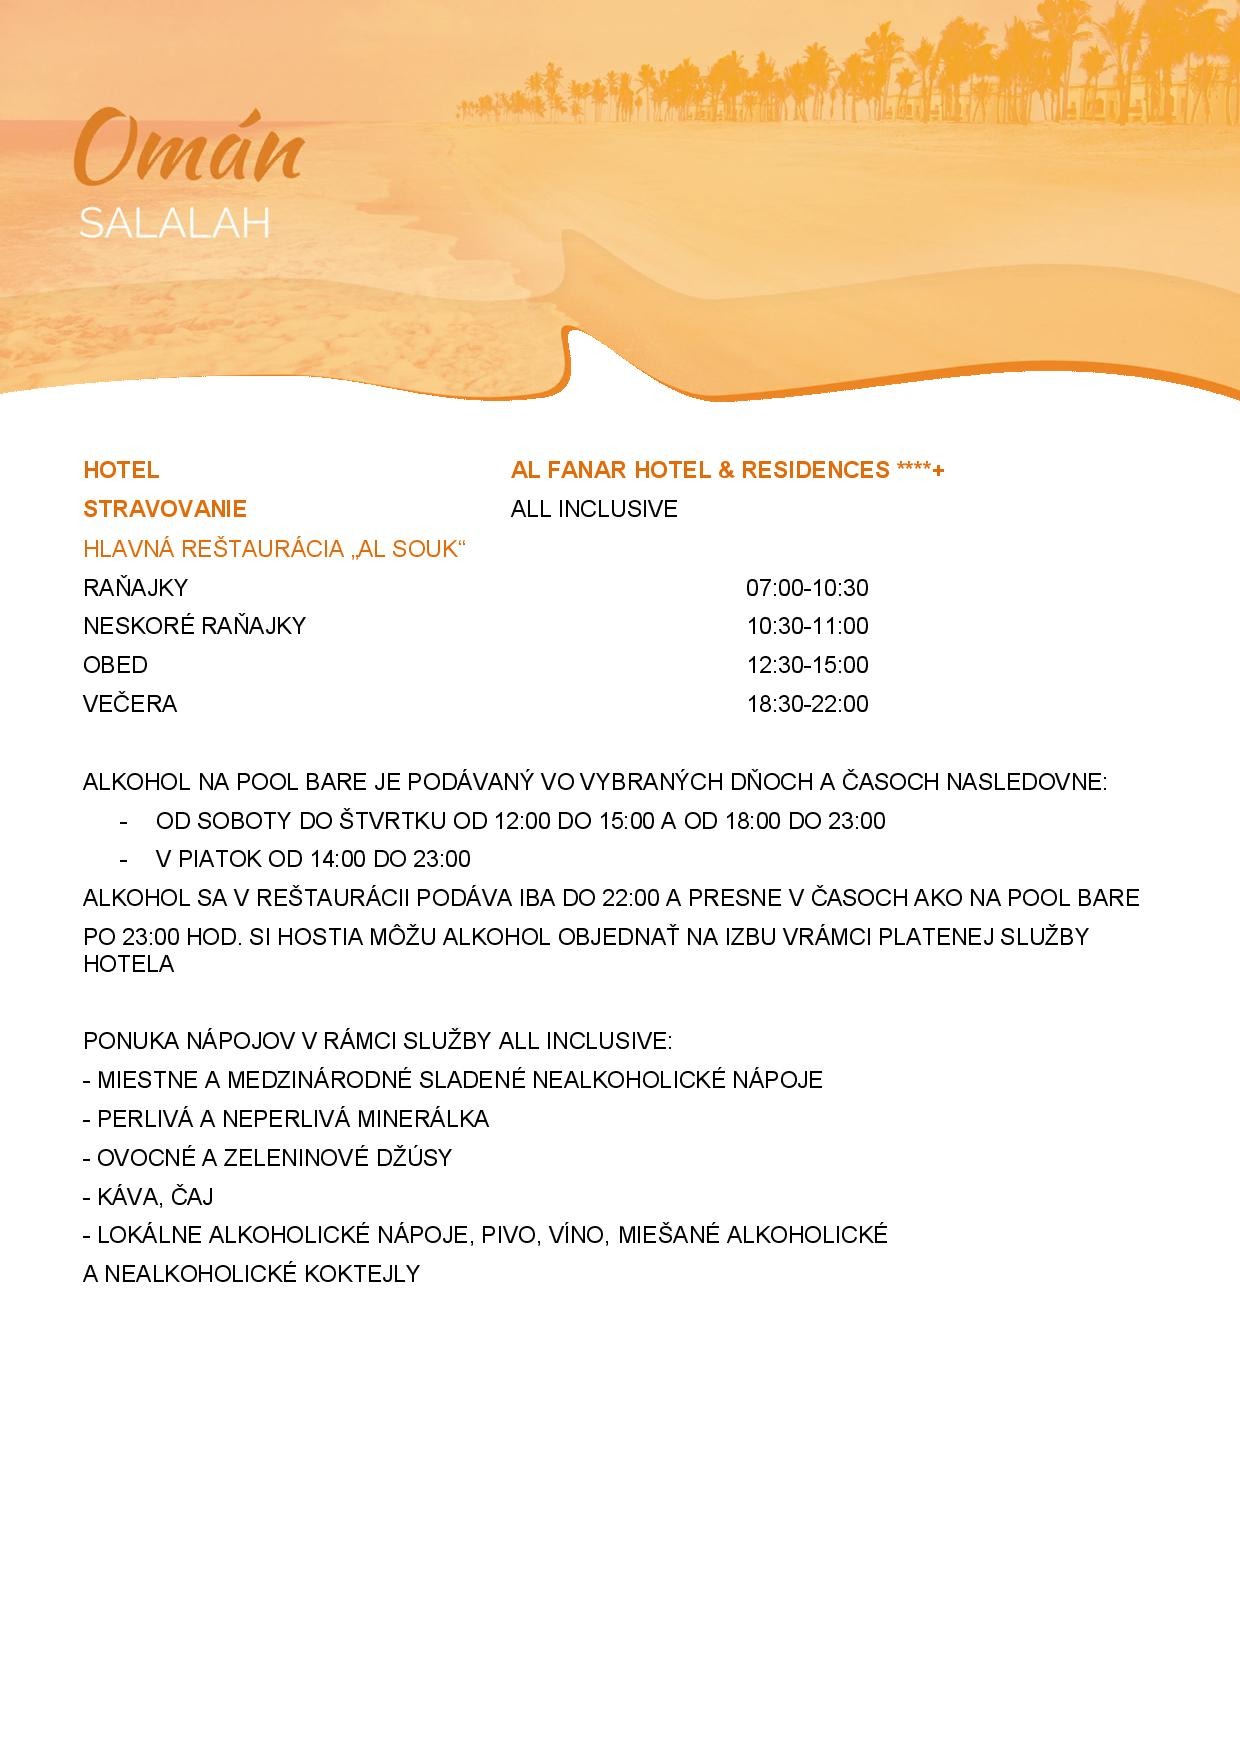 AI_OMN_Salalah_AlFanarHotel_UPDT1-page-001